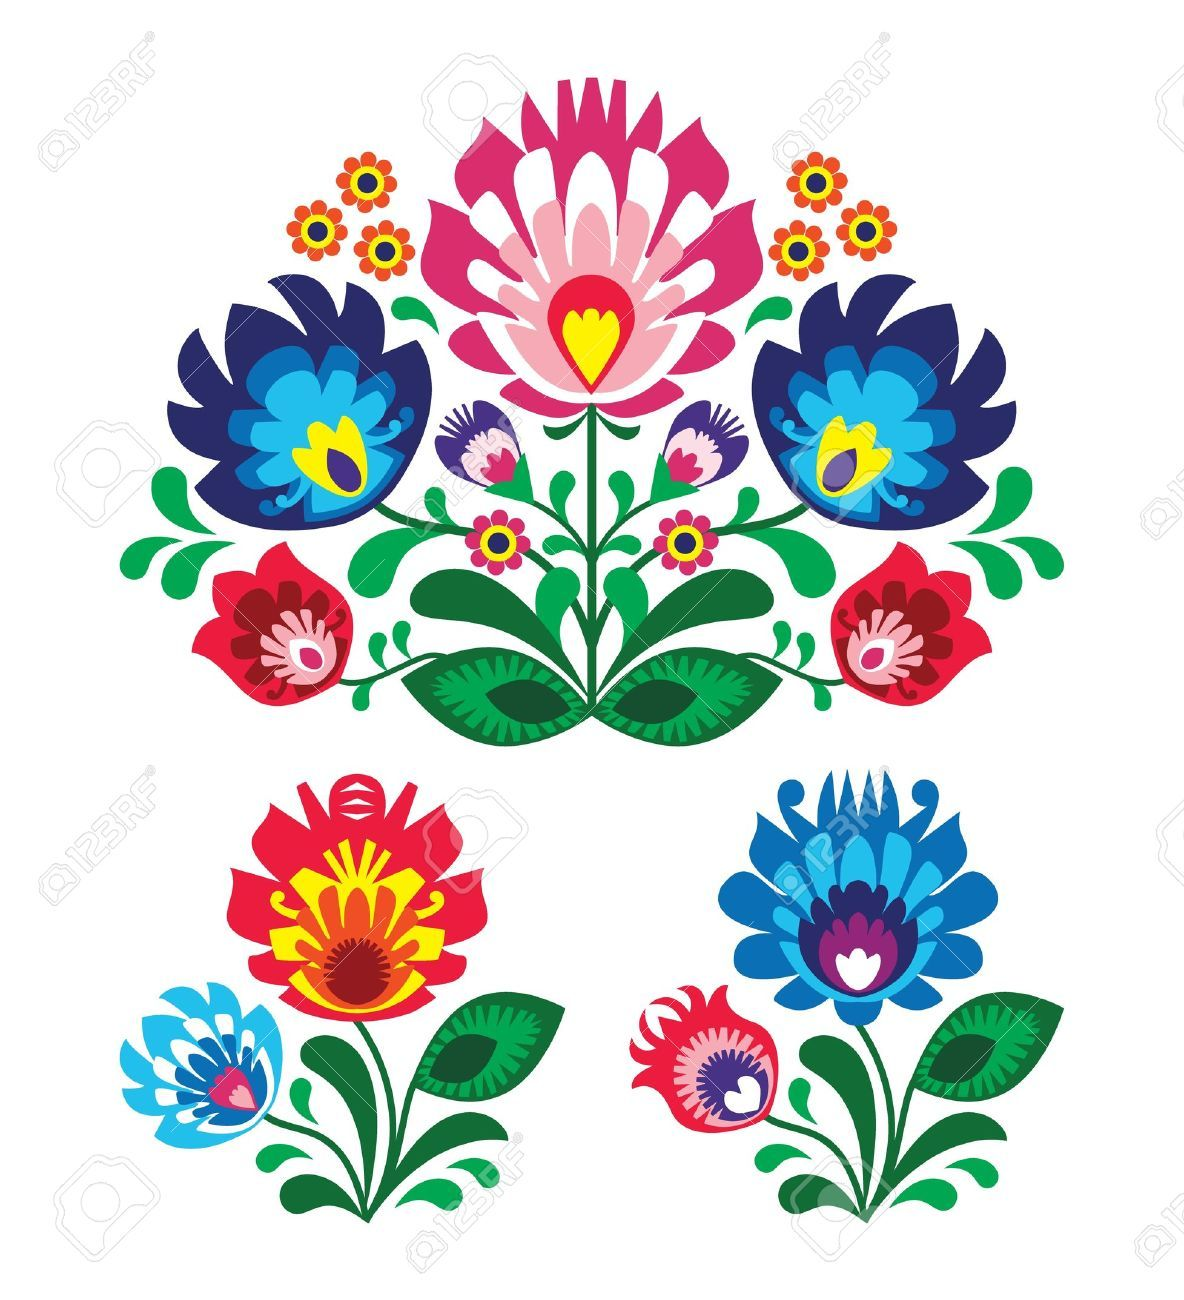 Mexican Flower Tattoos Google Search Folk Embroidery Polish Folk Art Paper Embroidery